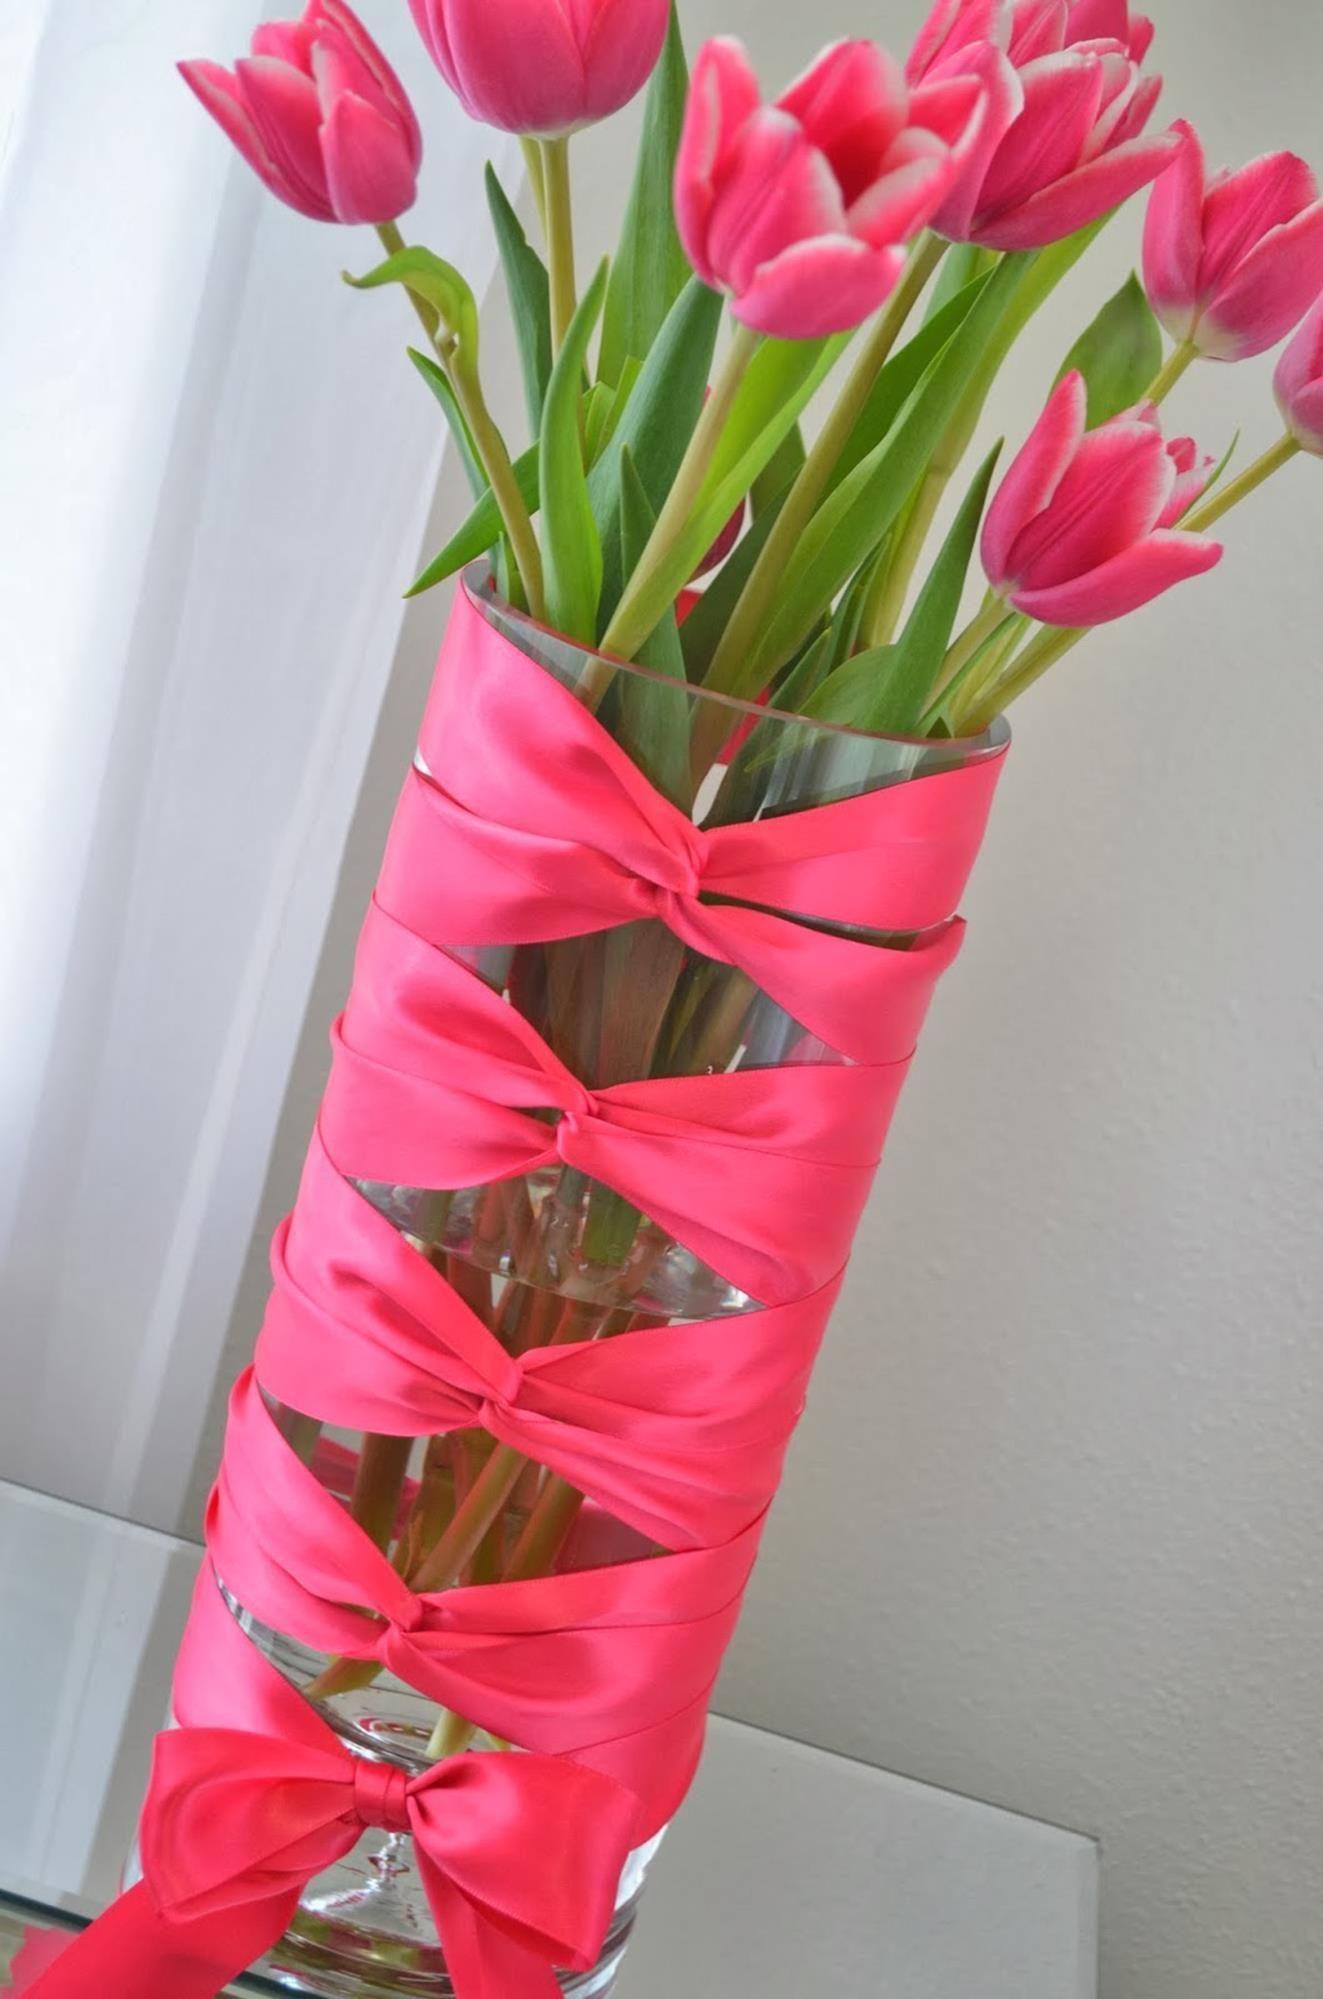 44 diy beautiful flower vase decoration ideas flowervase 44 diy beautiful flower vase decoration ideas flowervase vasesideasbloemen vasesdecorideas izmirmasajfo